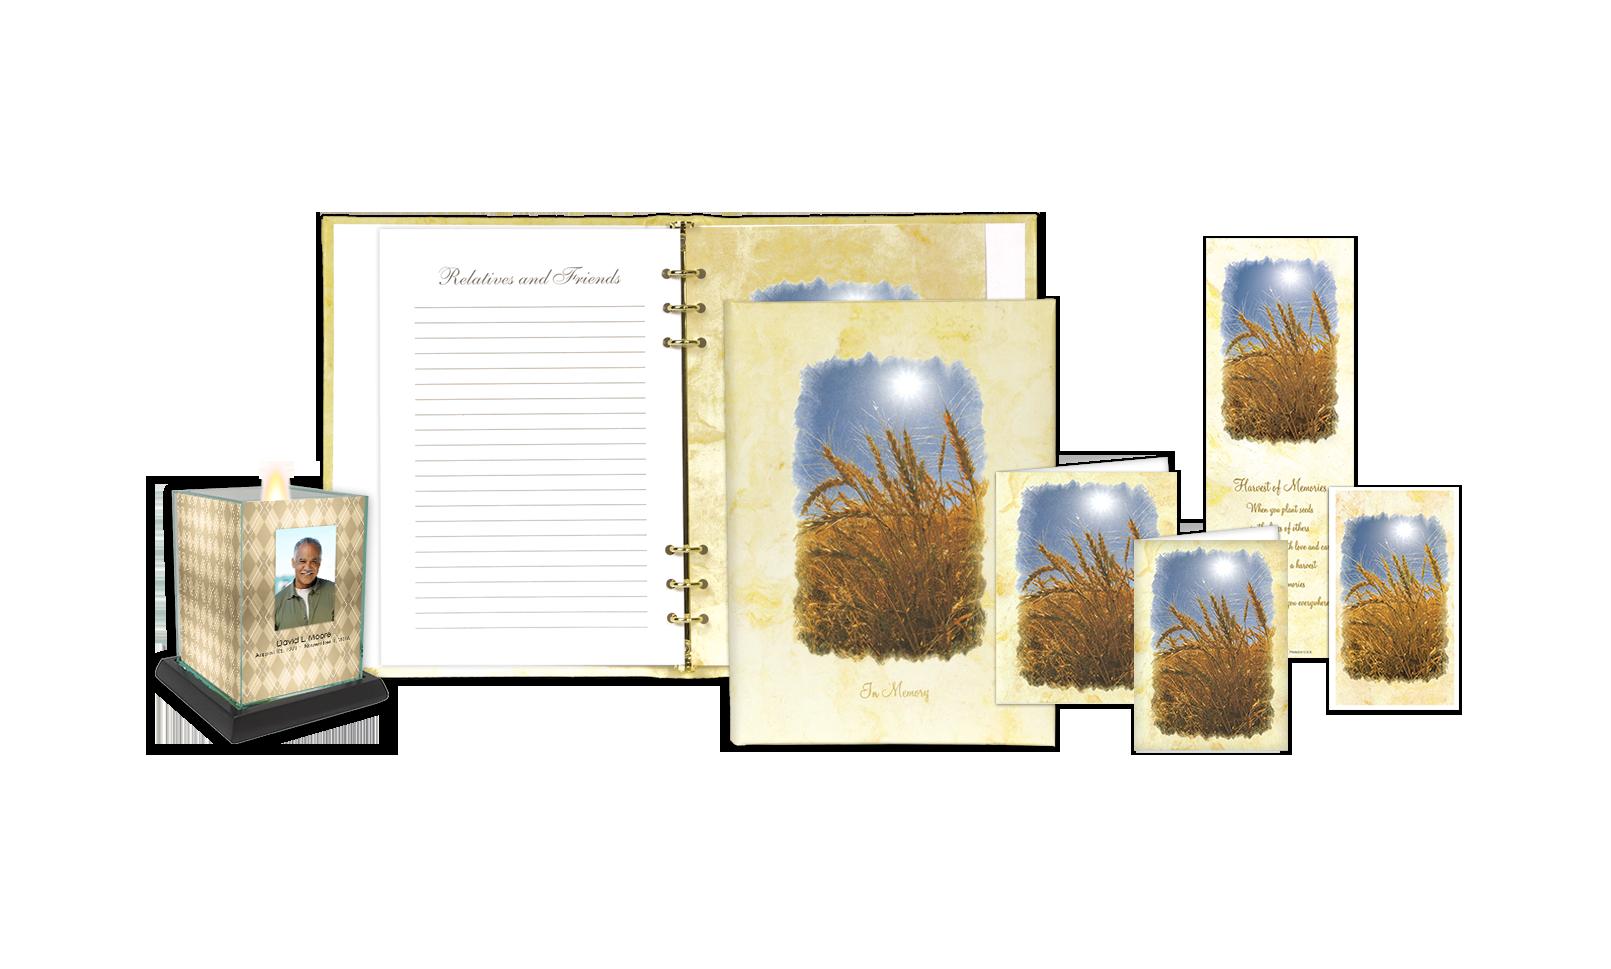 Golden Harvest Series 239 IC